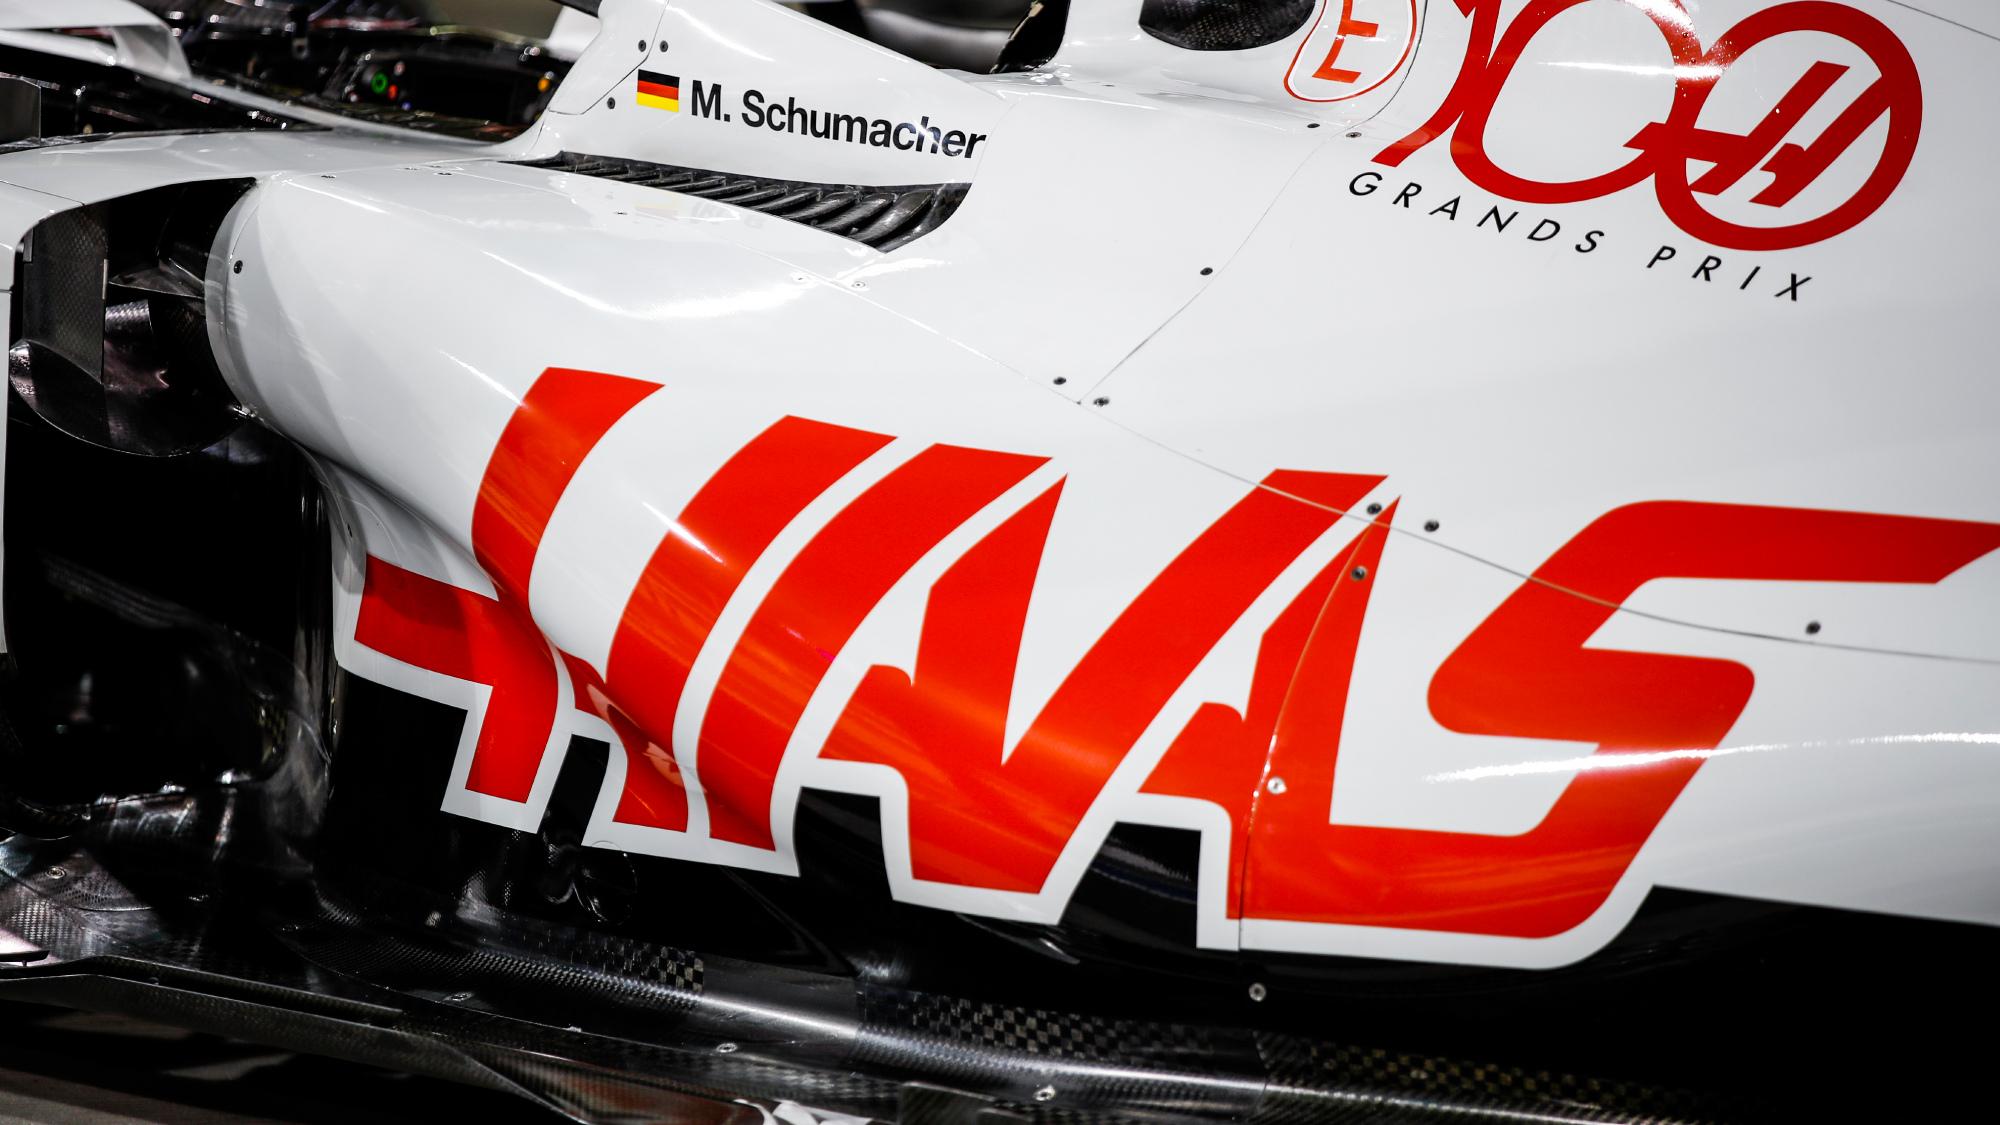 Mick Schumacher, 2020 Abu Dhabi test